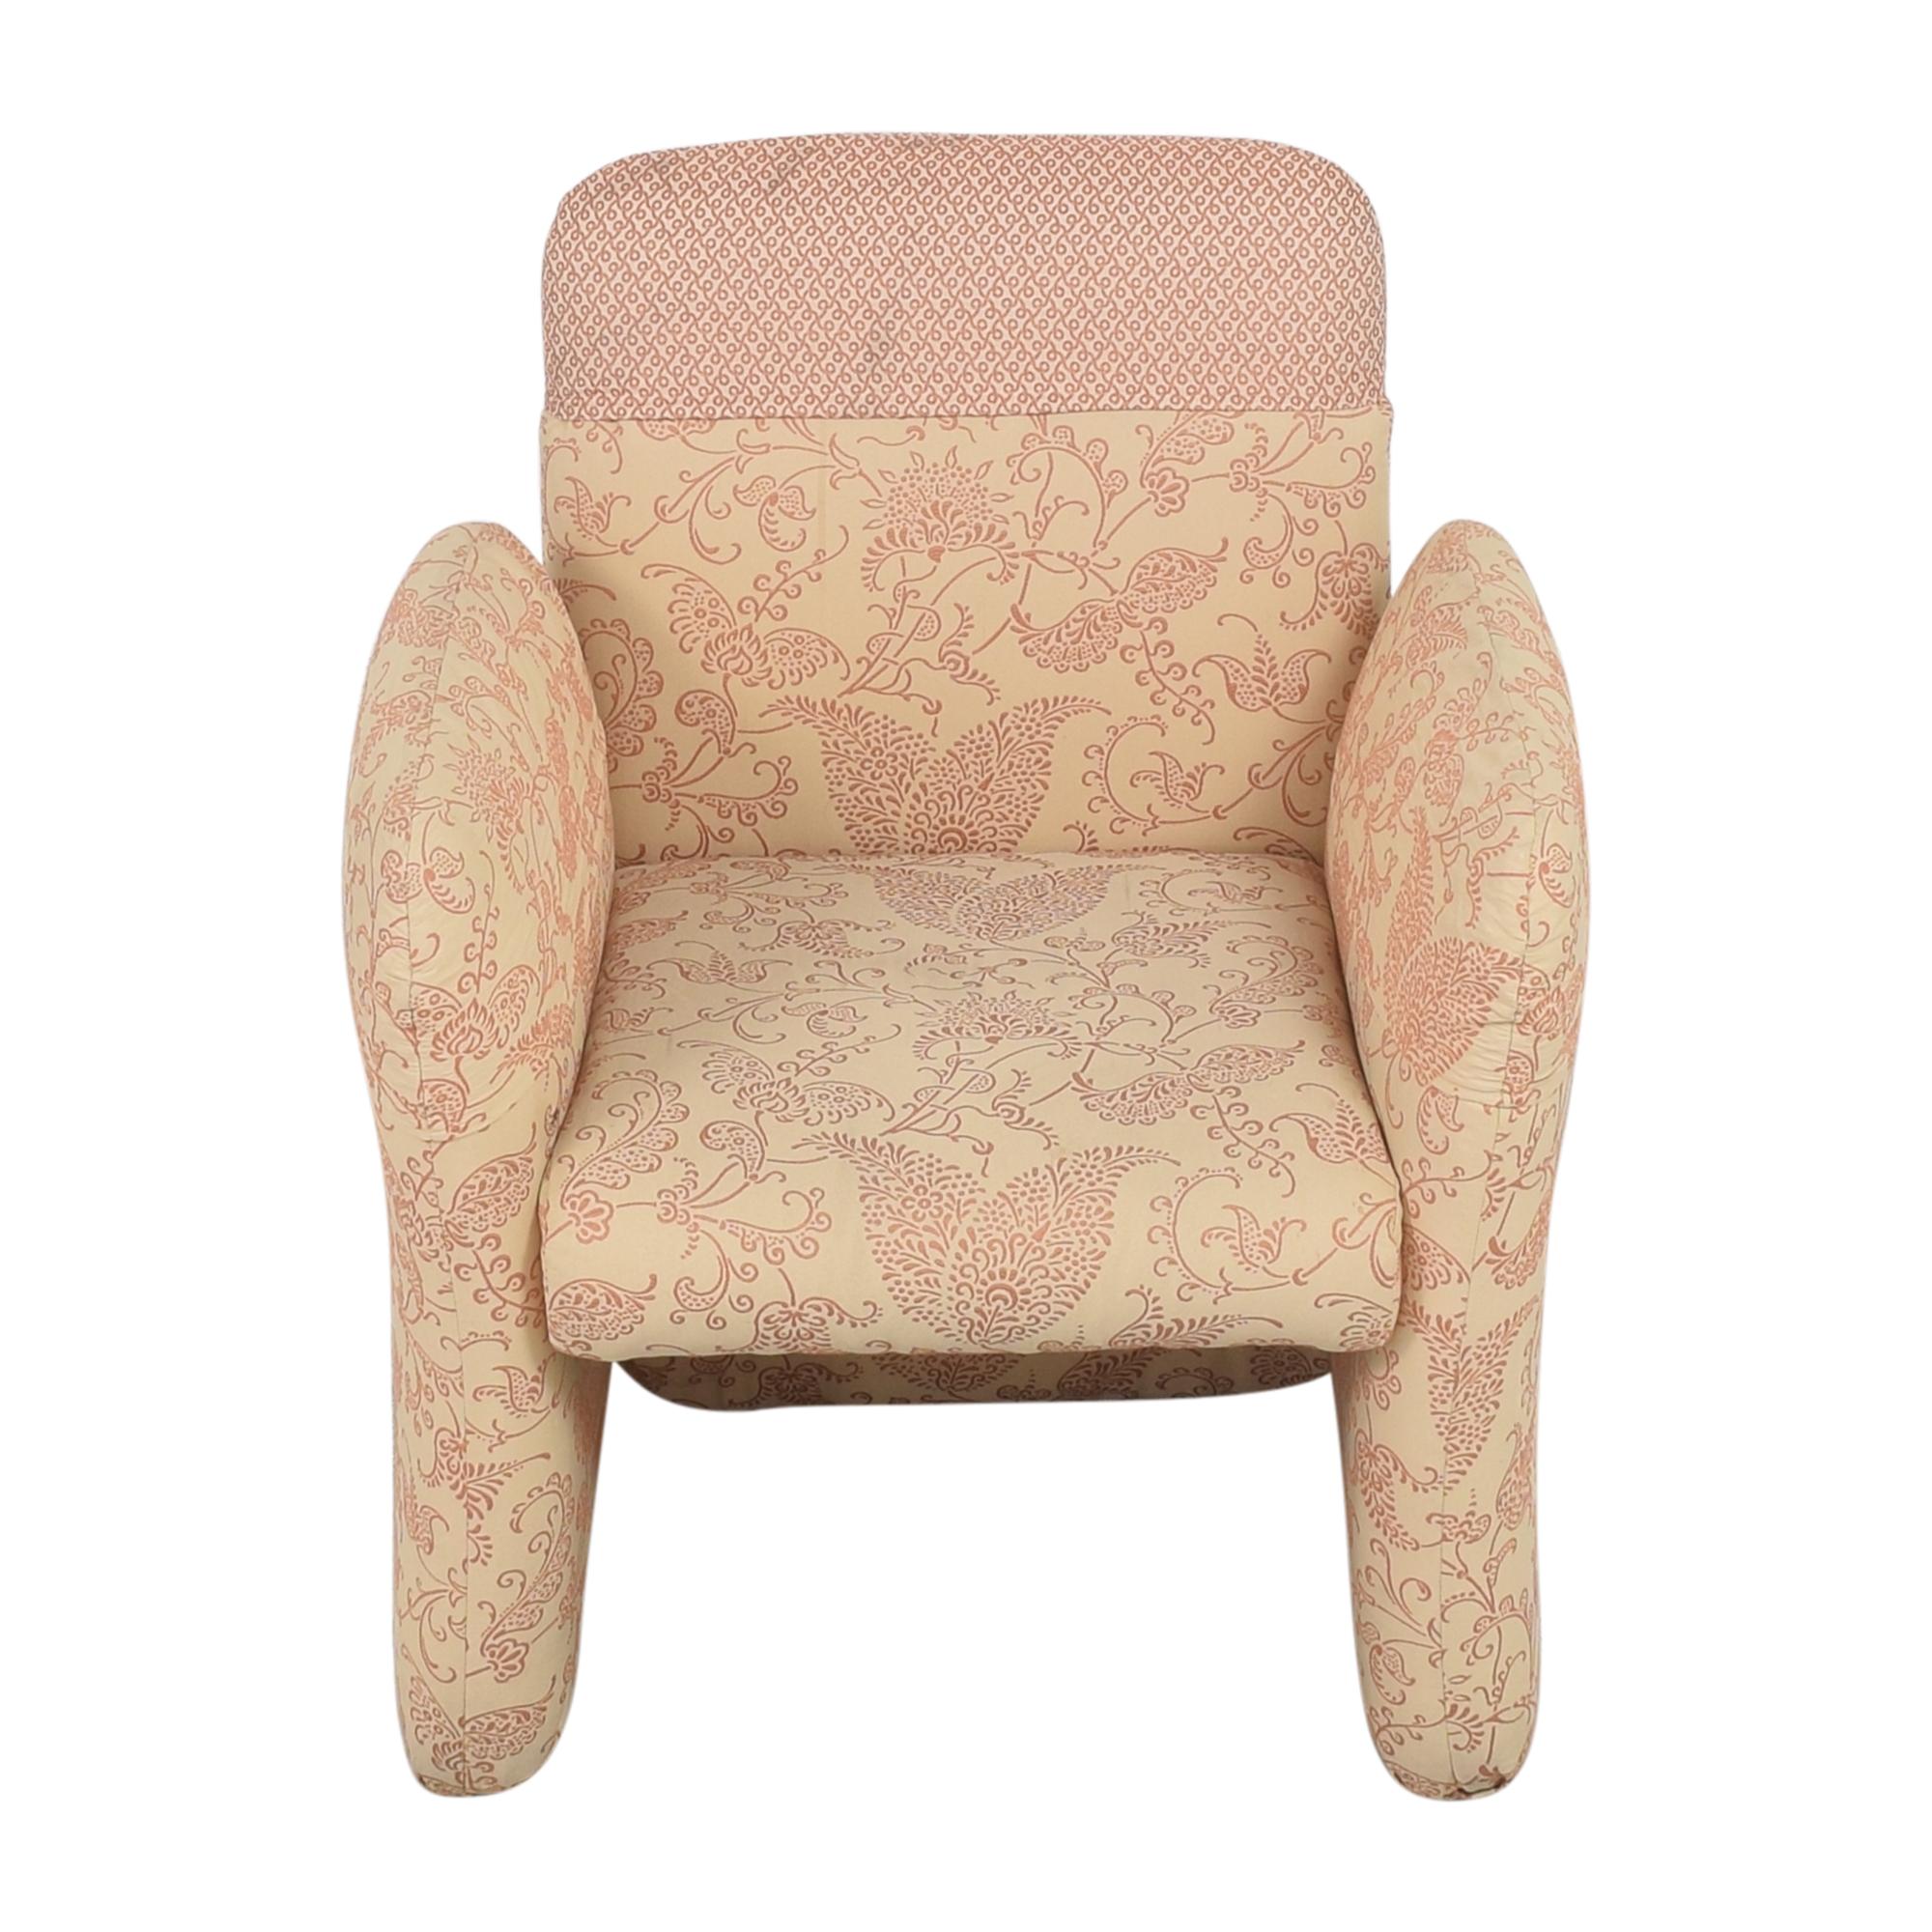 shop Bloomingdale's Milo Baughman-Style Club Chair Bloomingdale's Chairs